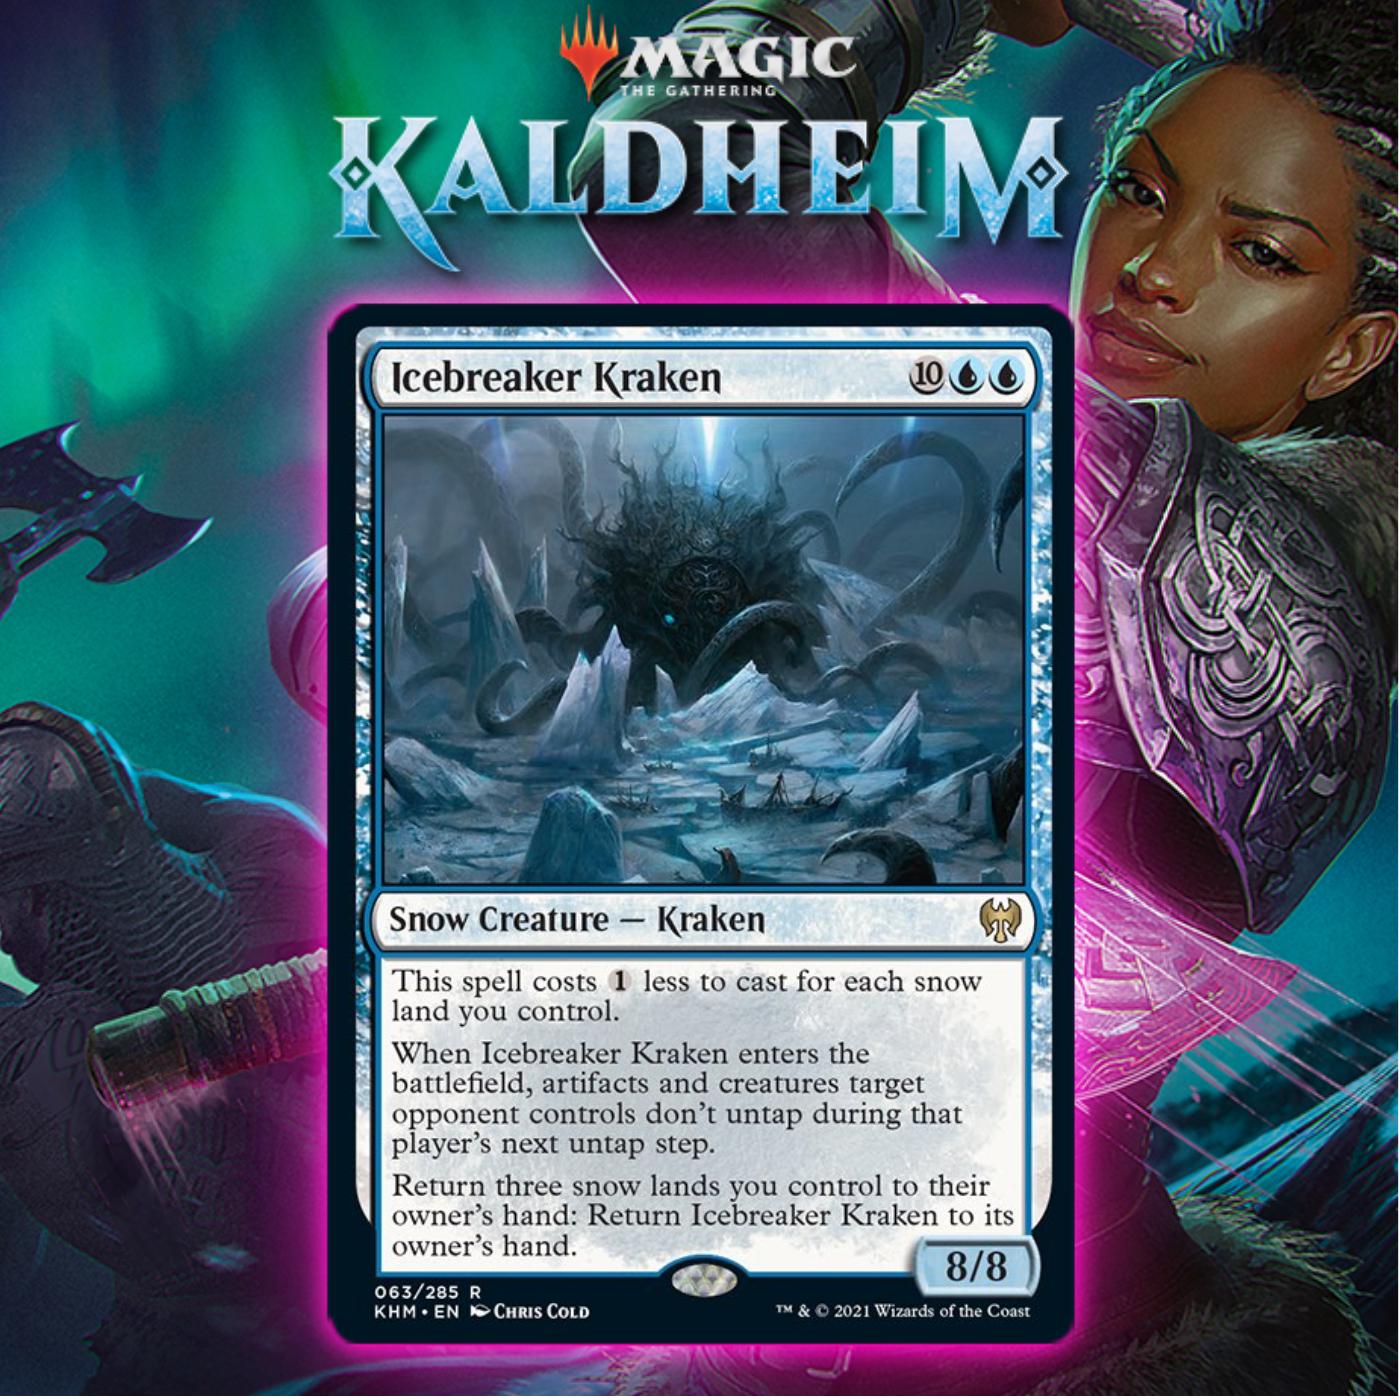 Blue Releases The Kraken With Icebreaker Kraken In Kaldheim